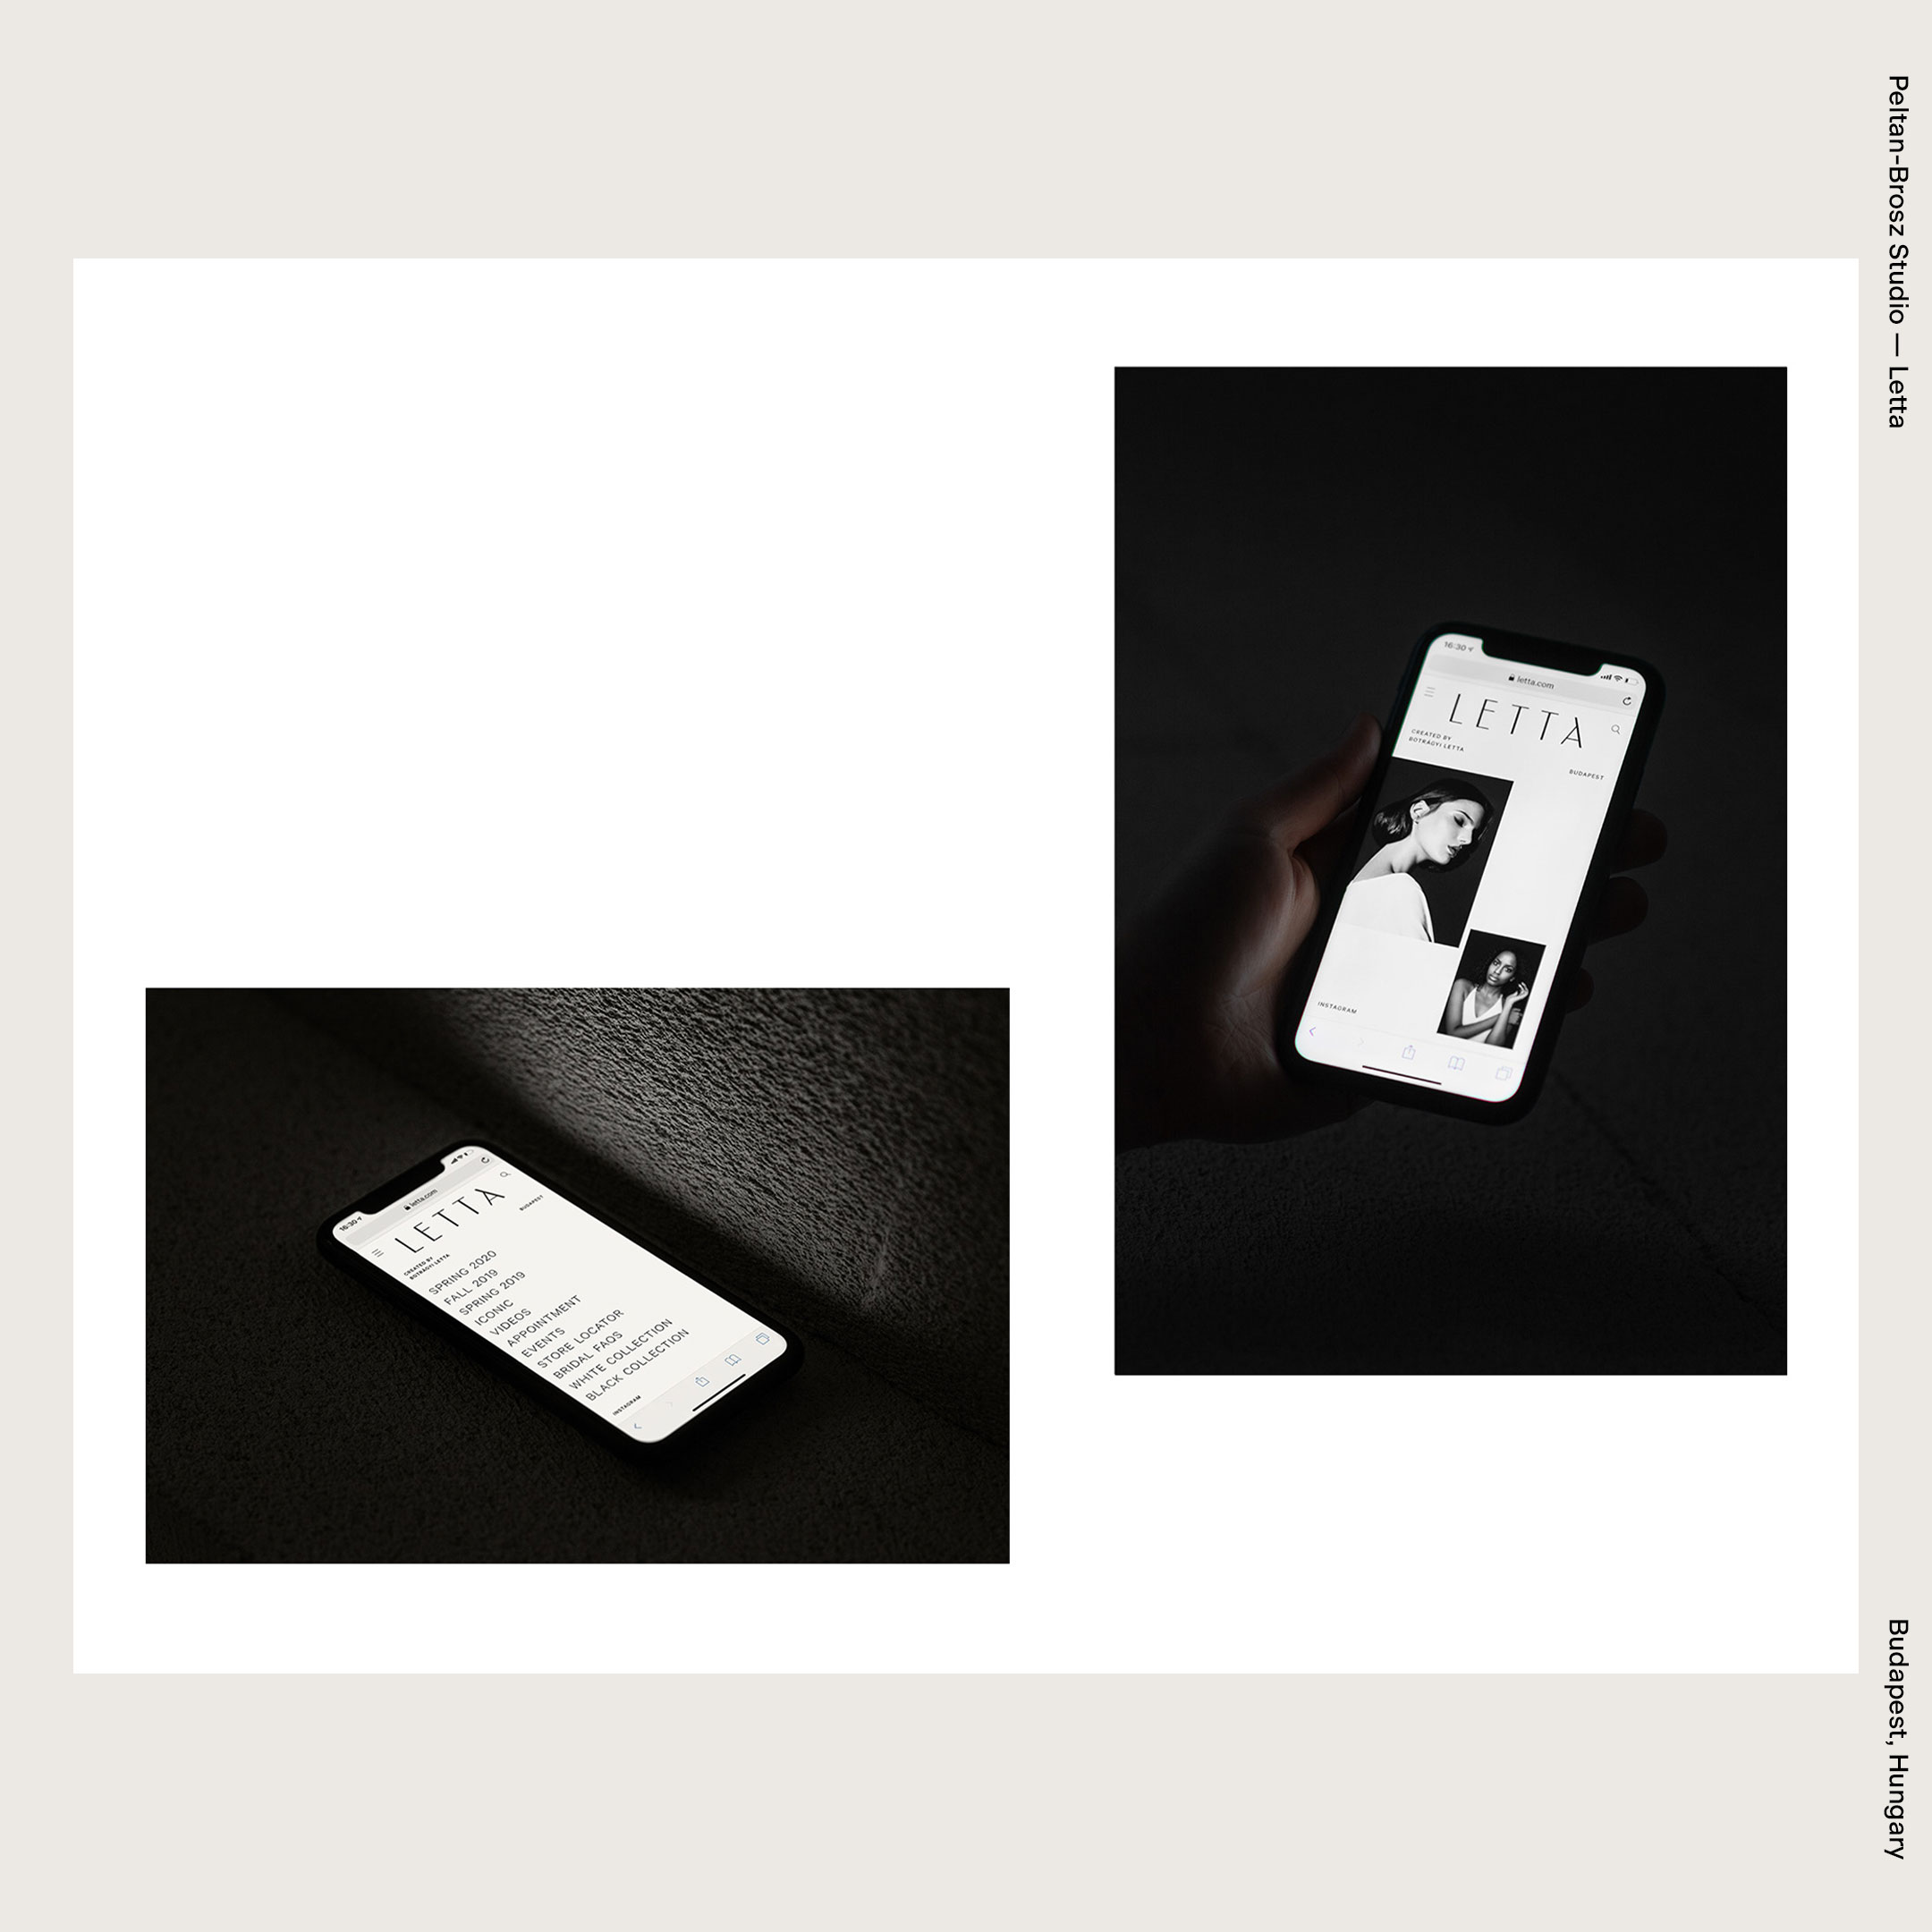 Peltan-Brosz Studio — Letta